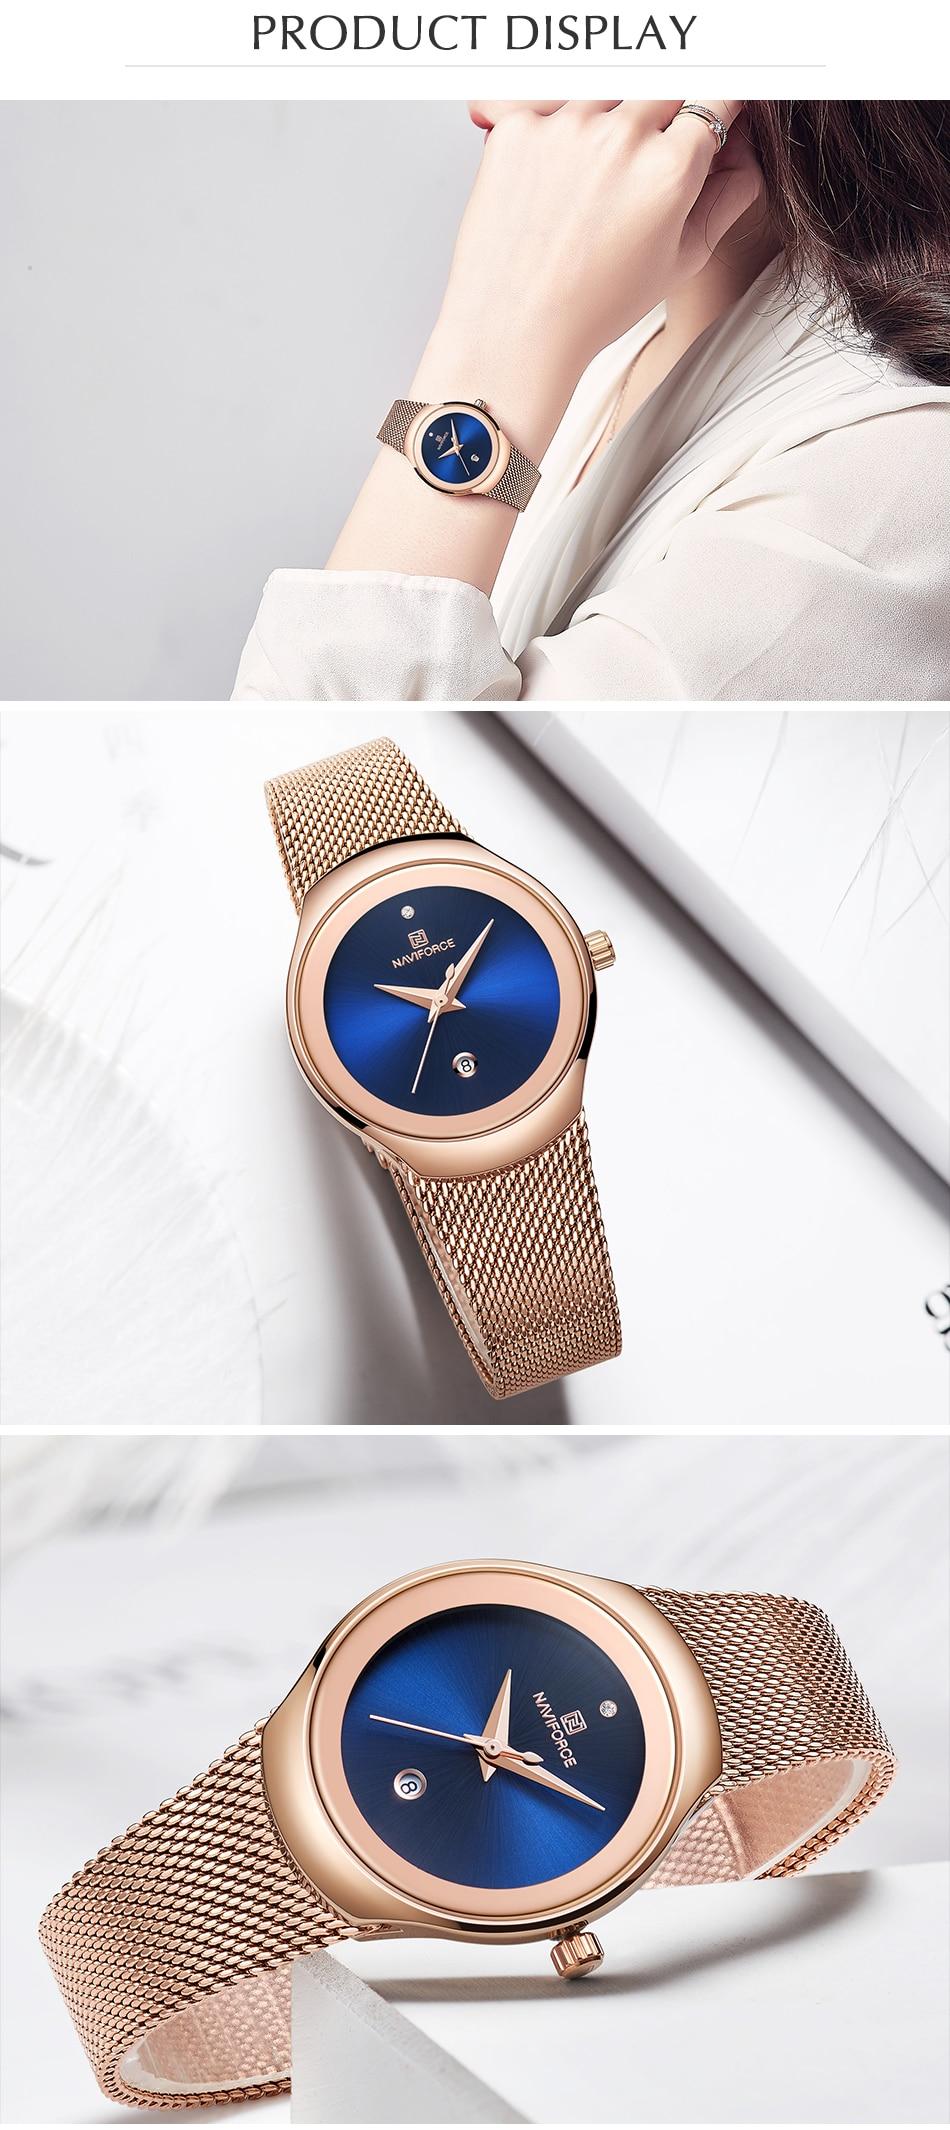 NAVIFORCE Top Luxury Brand Women Watches Female Fashion Simple Quartz Watch Ladies Classic Stainless Steel Mesh Belt Wrist Watch 9